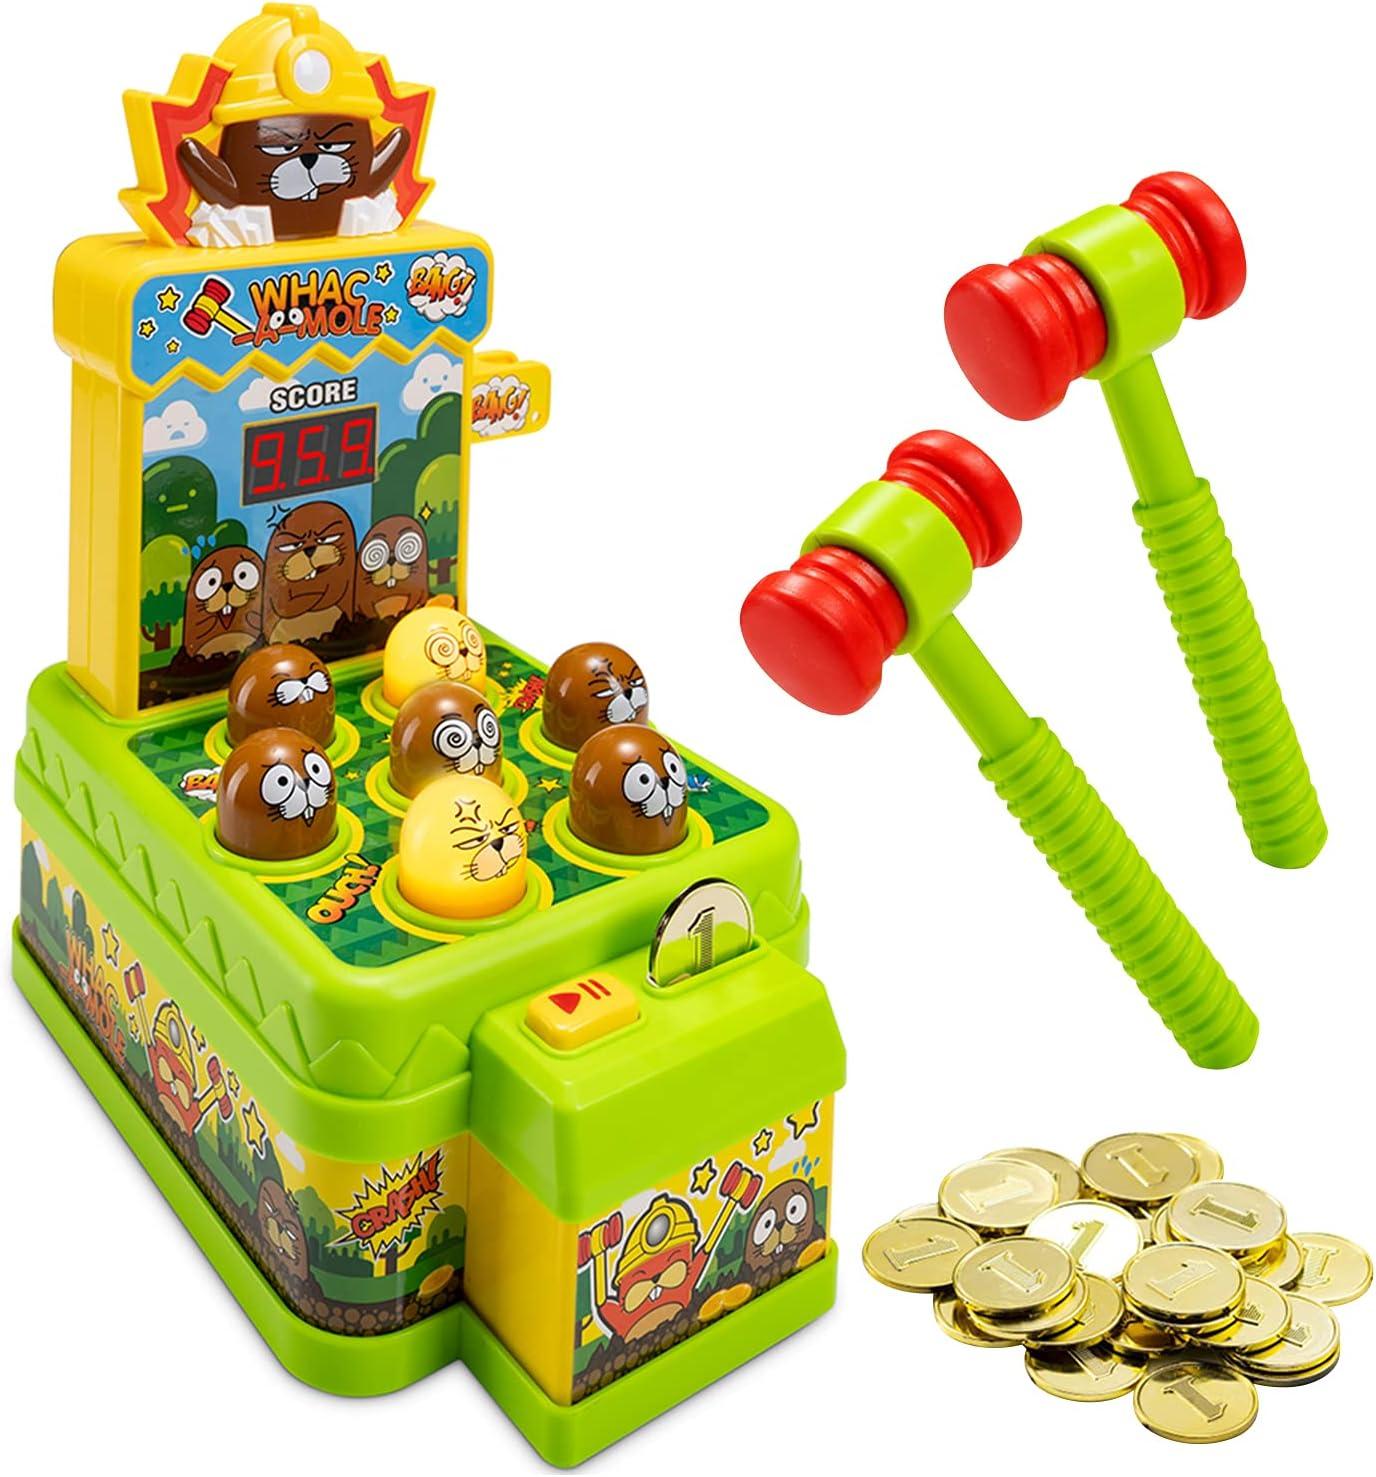 Whack A depot Mole Game for Kids Ranking TOP11 - Dual Ga Arcade Mini Electronic Mode